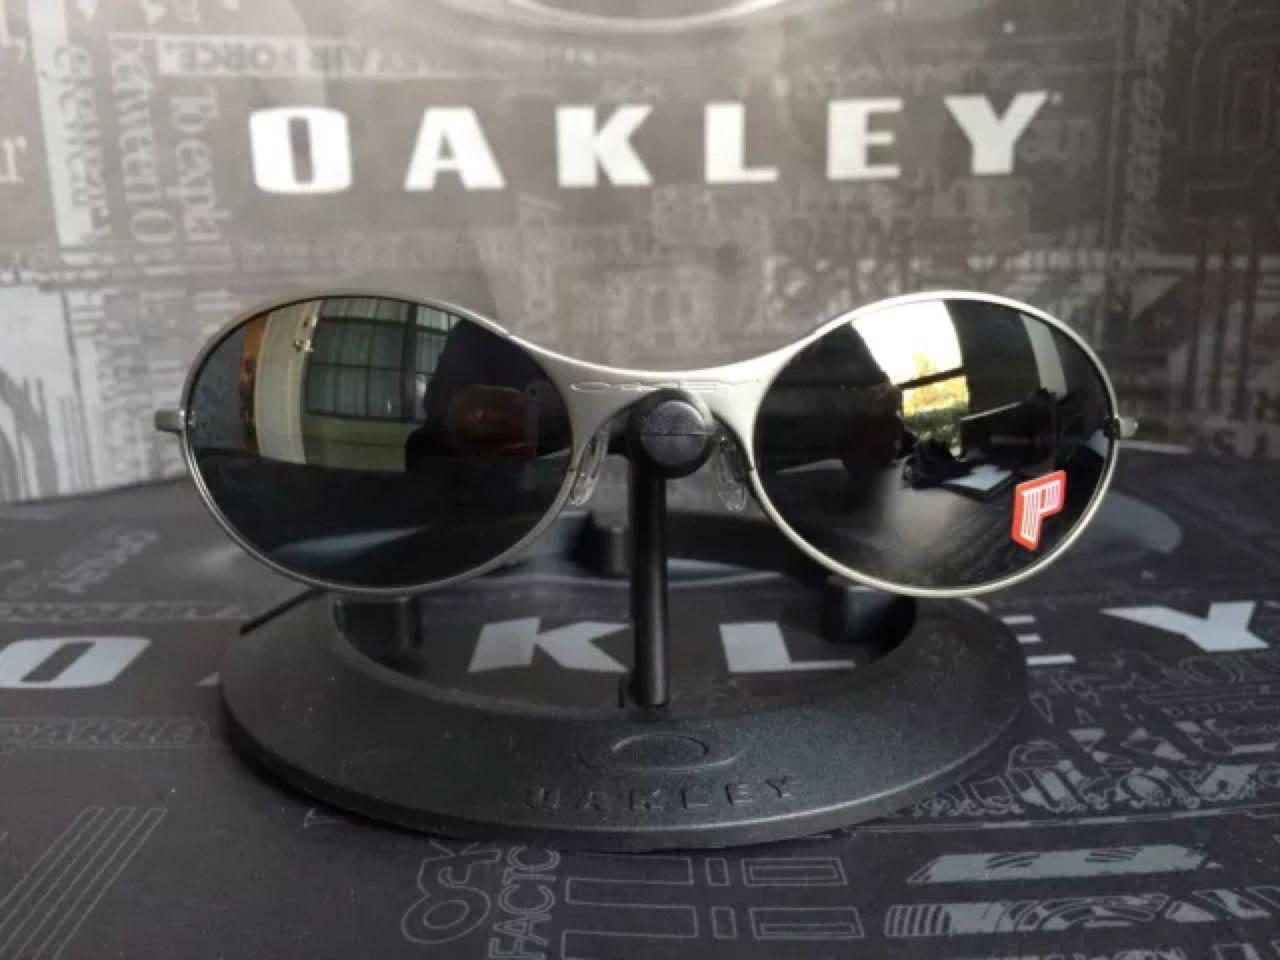 d736ef77f7a ... amazon matrix sunglasses oval sunglasses polarized sunglasses oakley  classic eyewear derby c6616 e7346